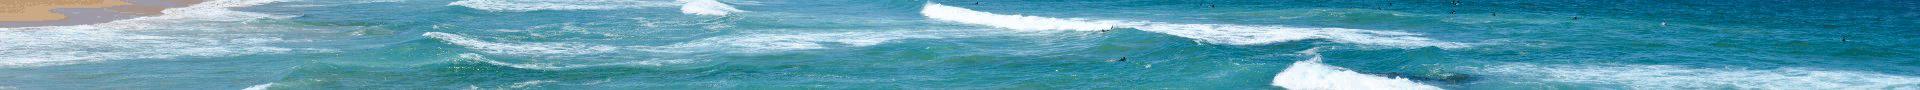 banner-ocean_shore.png.ea2d6431c98d509478e988ac0a440fdc.png